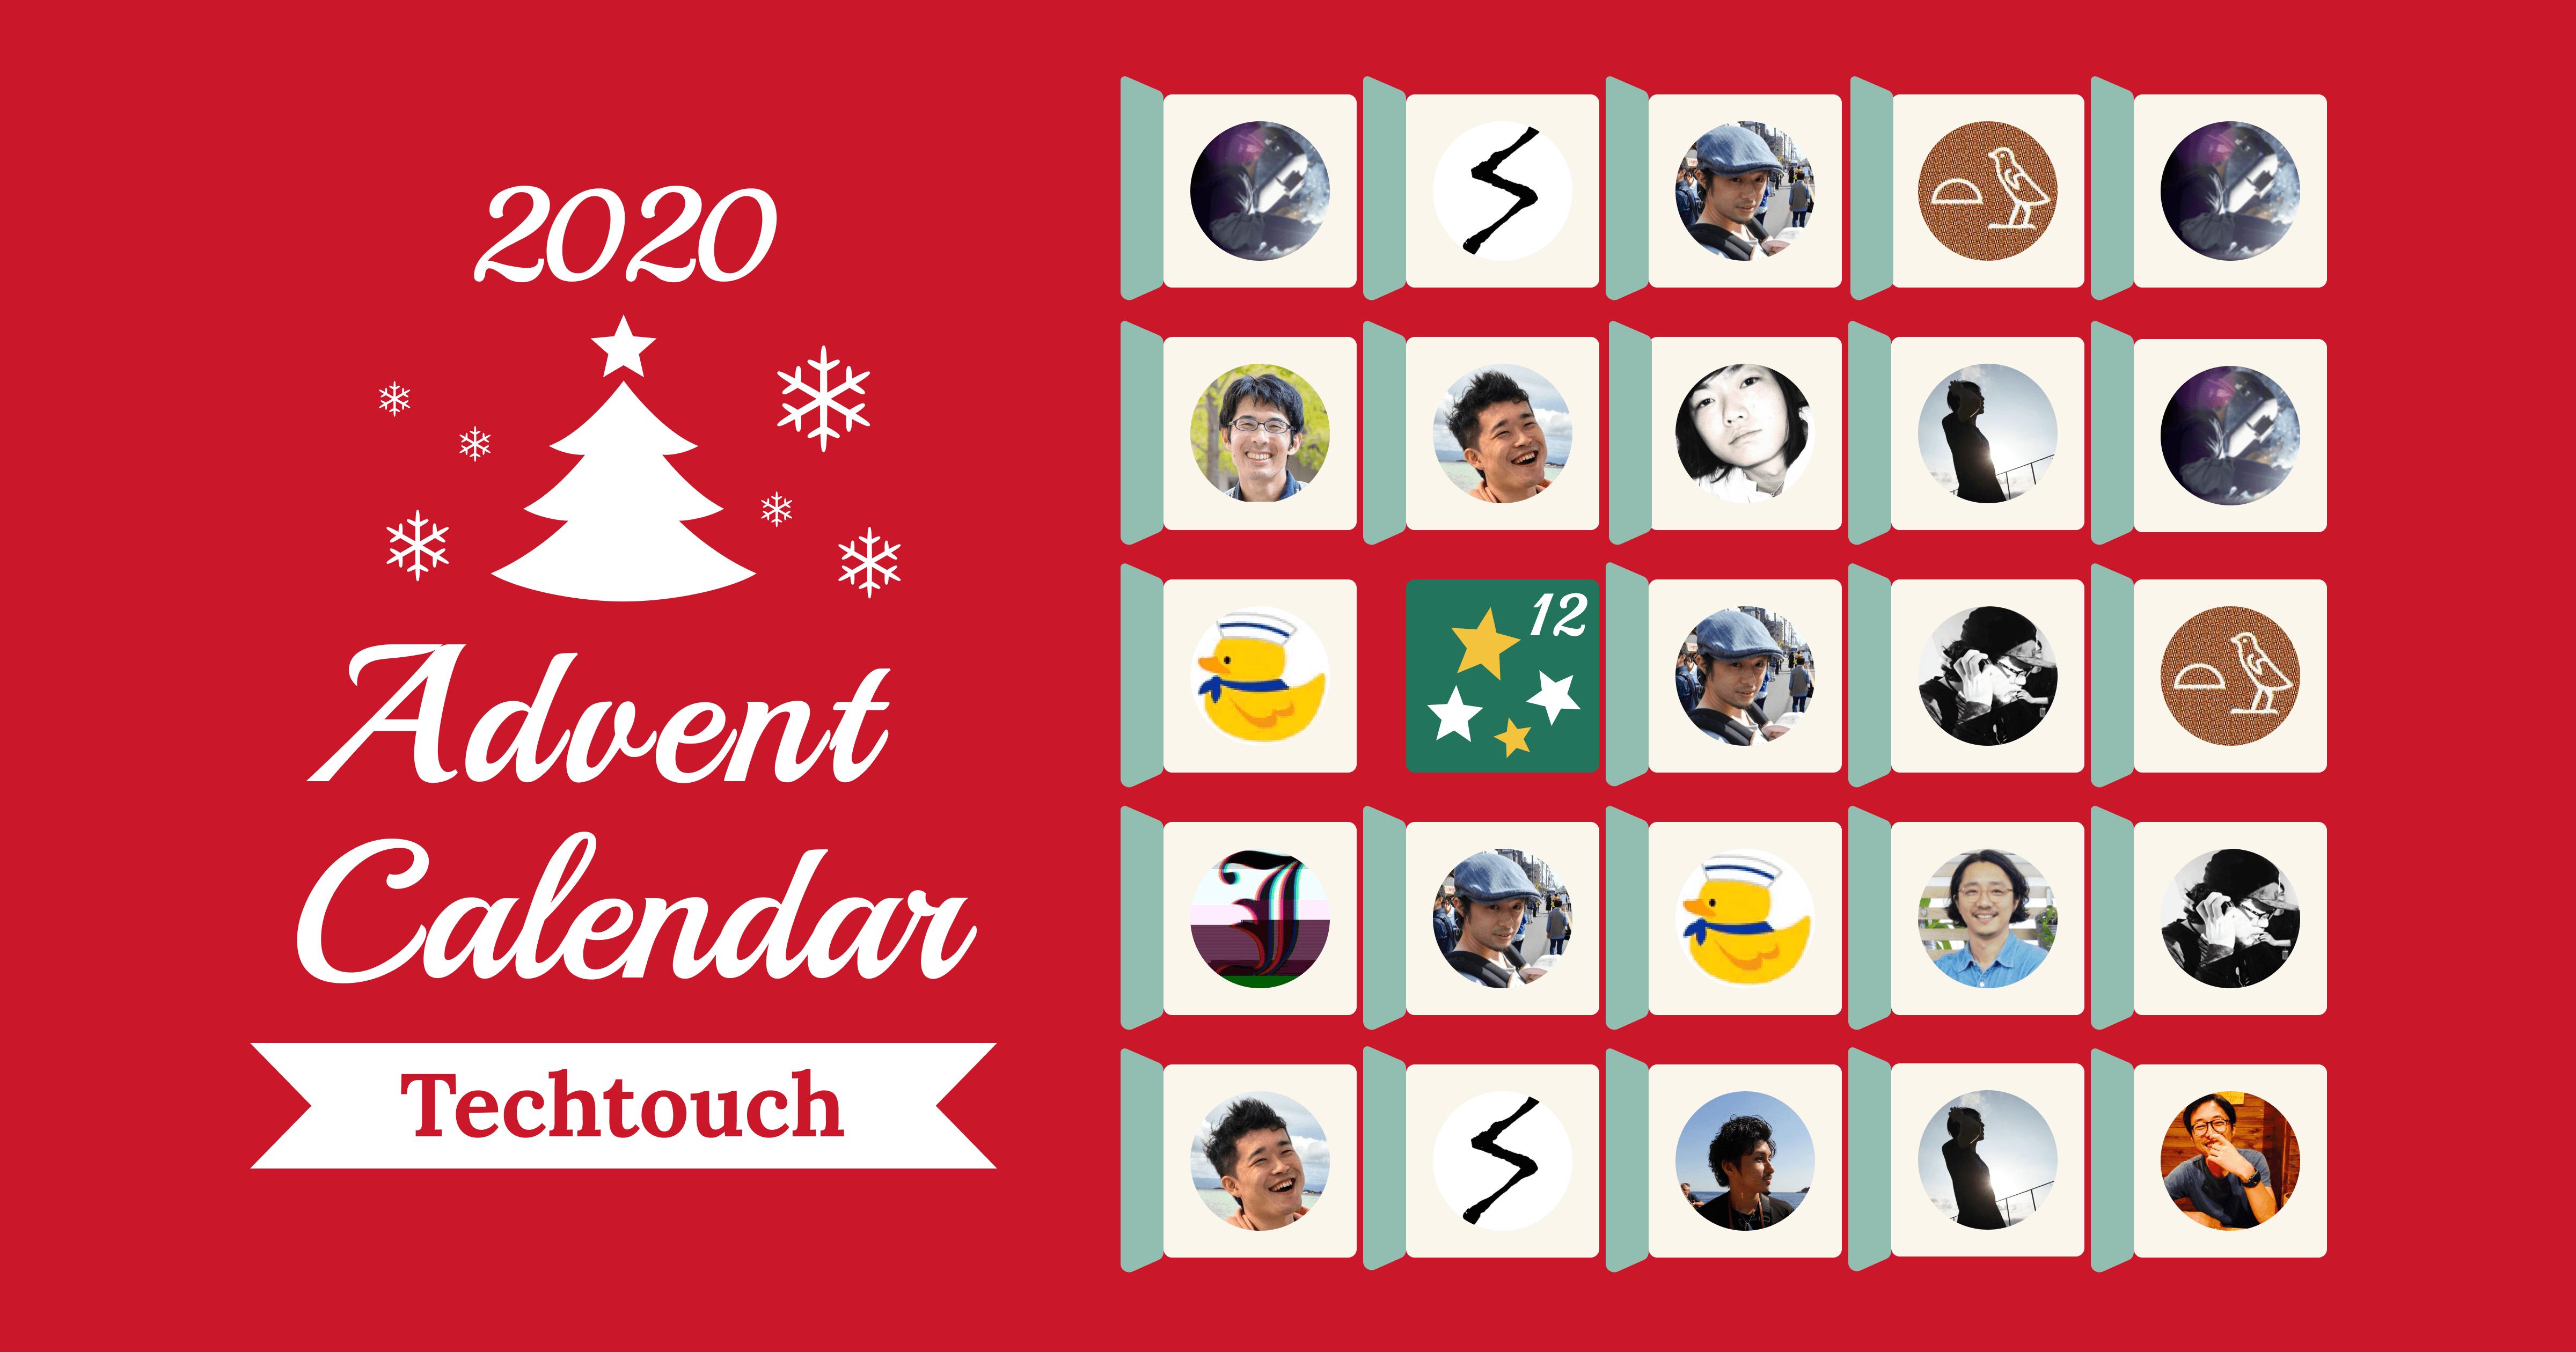 adventCalendar-day25